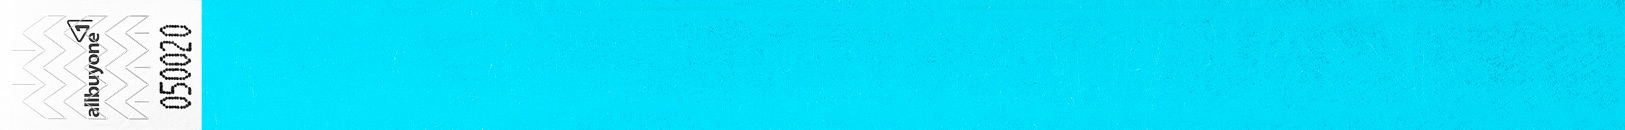 https://cdn.allbuyone.com/media/image/c0/8d/73/tyvek-19mm-1625x130px-neonblau.jpg